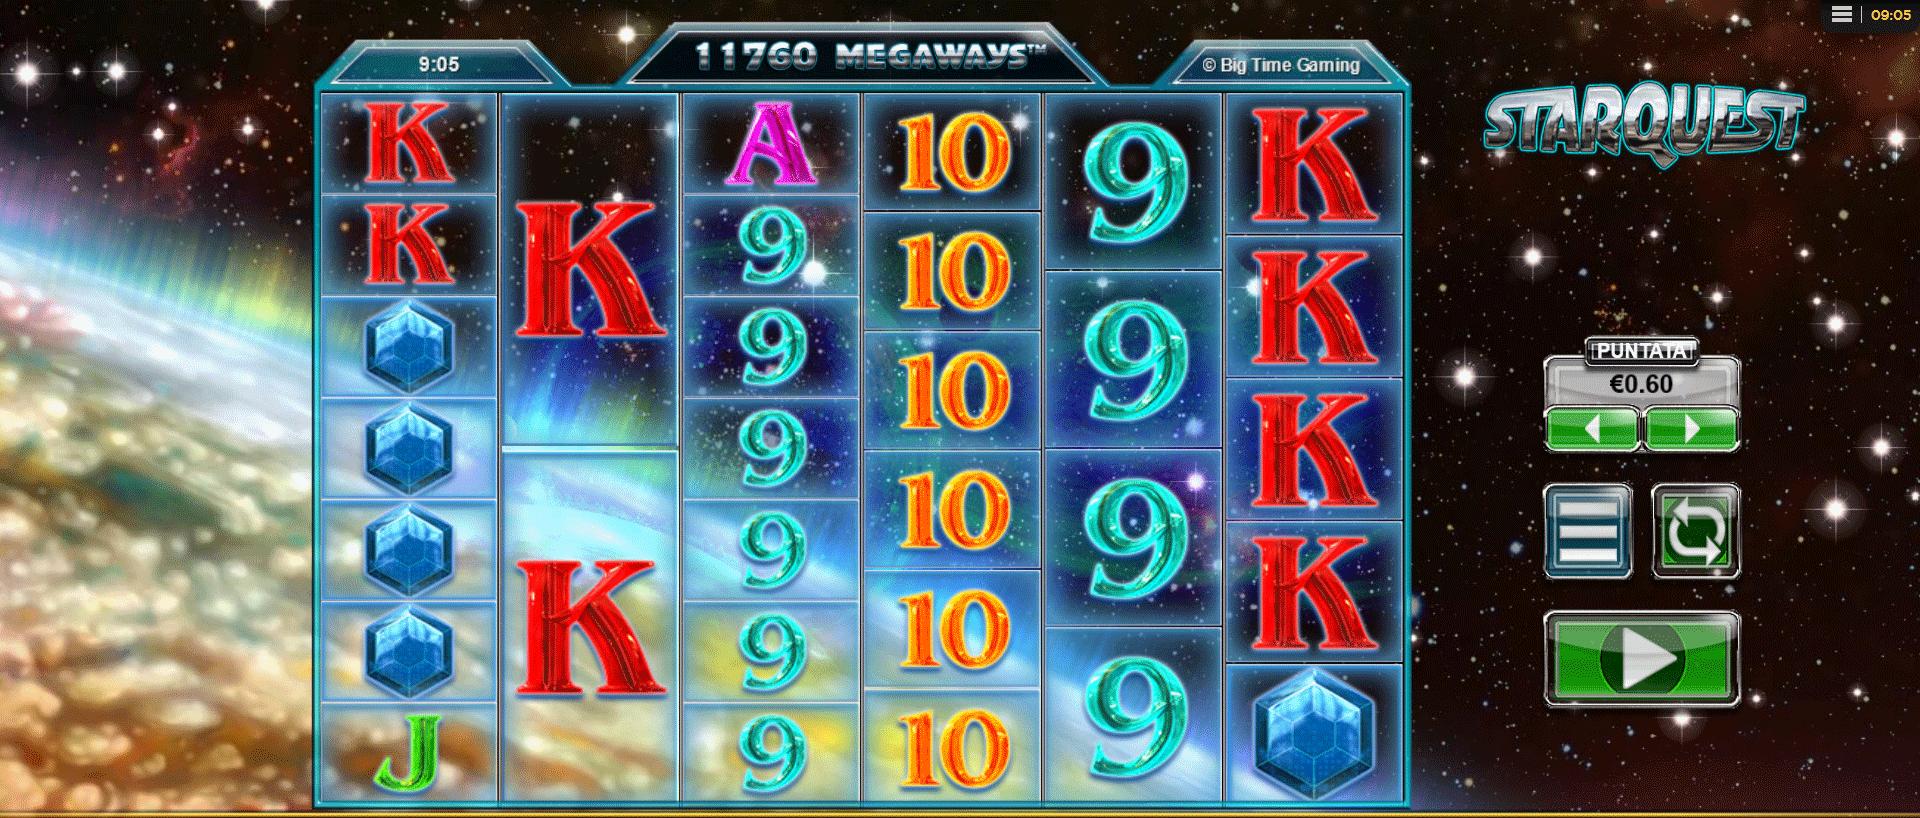 Slot StarQuest